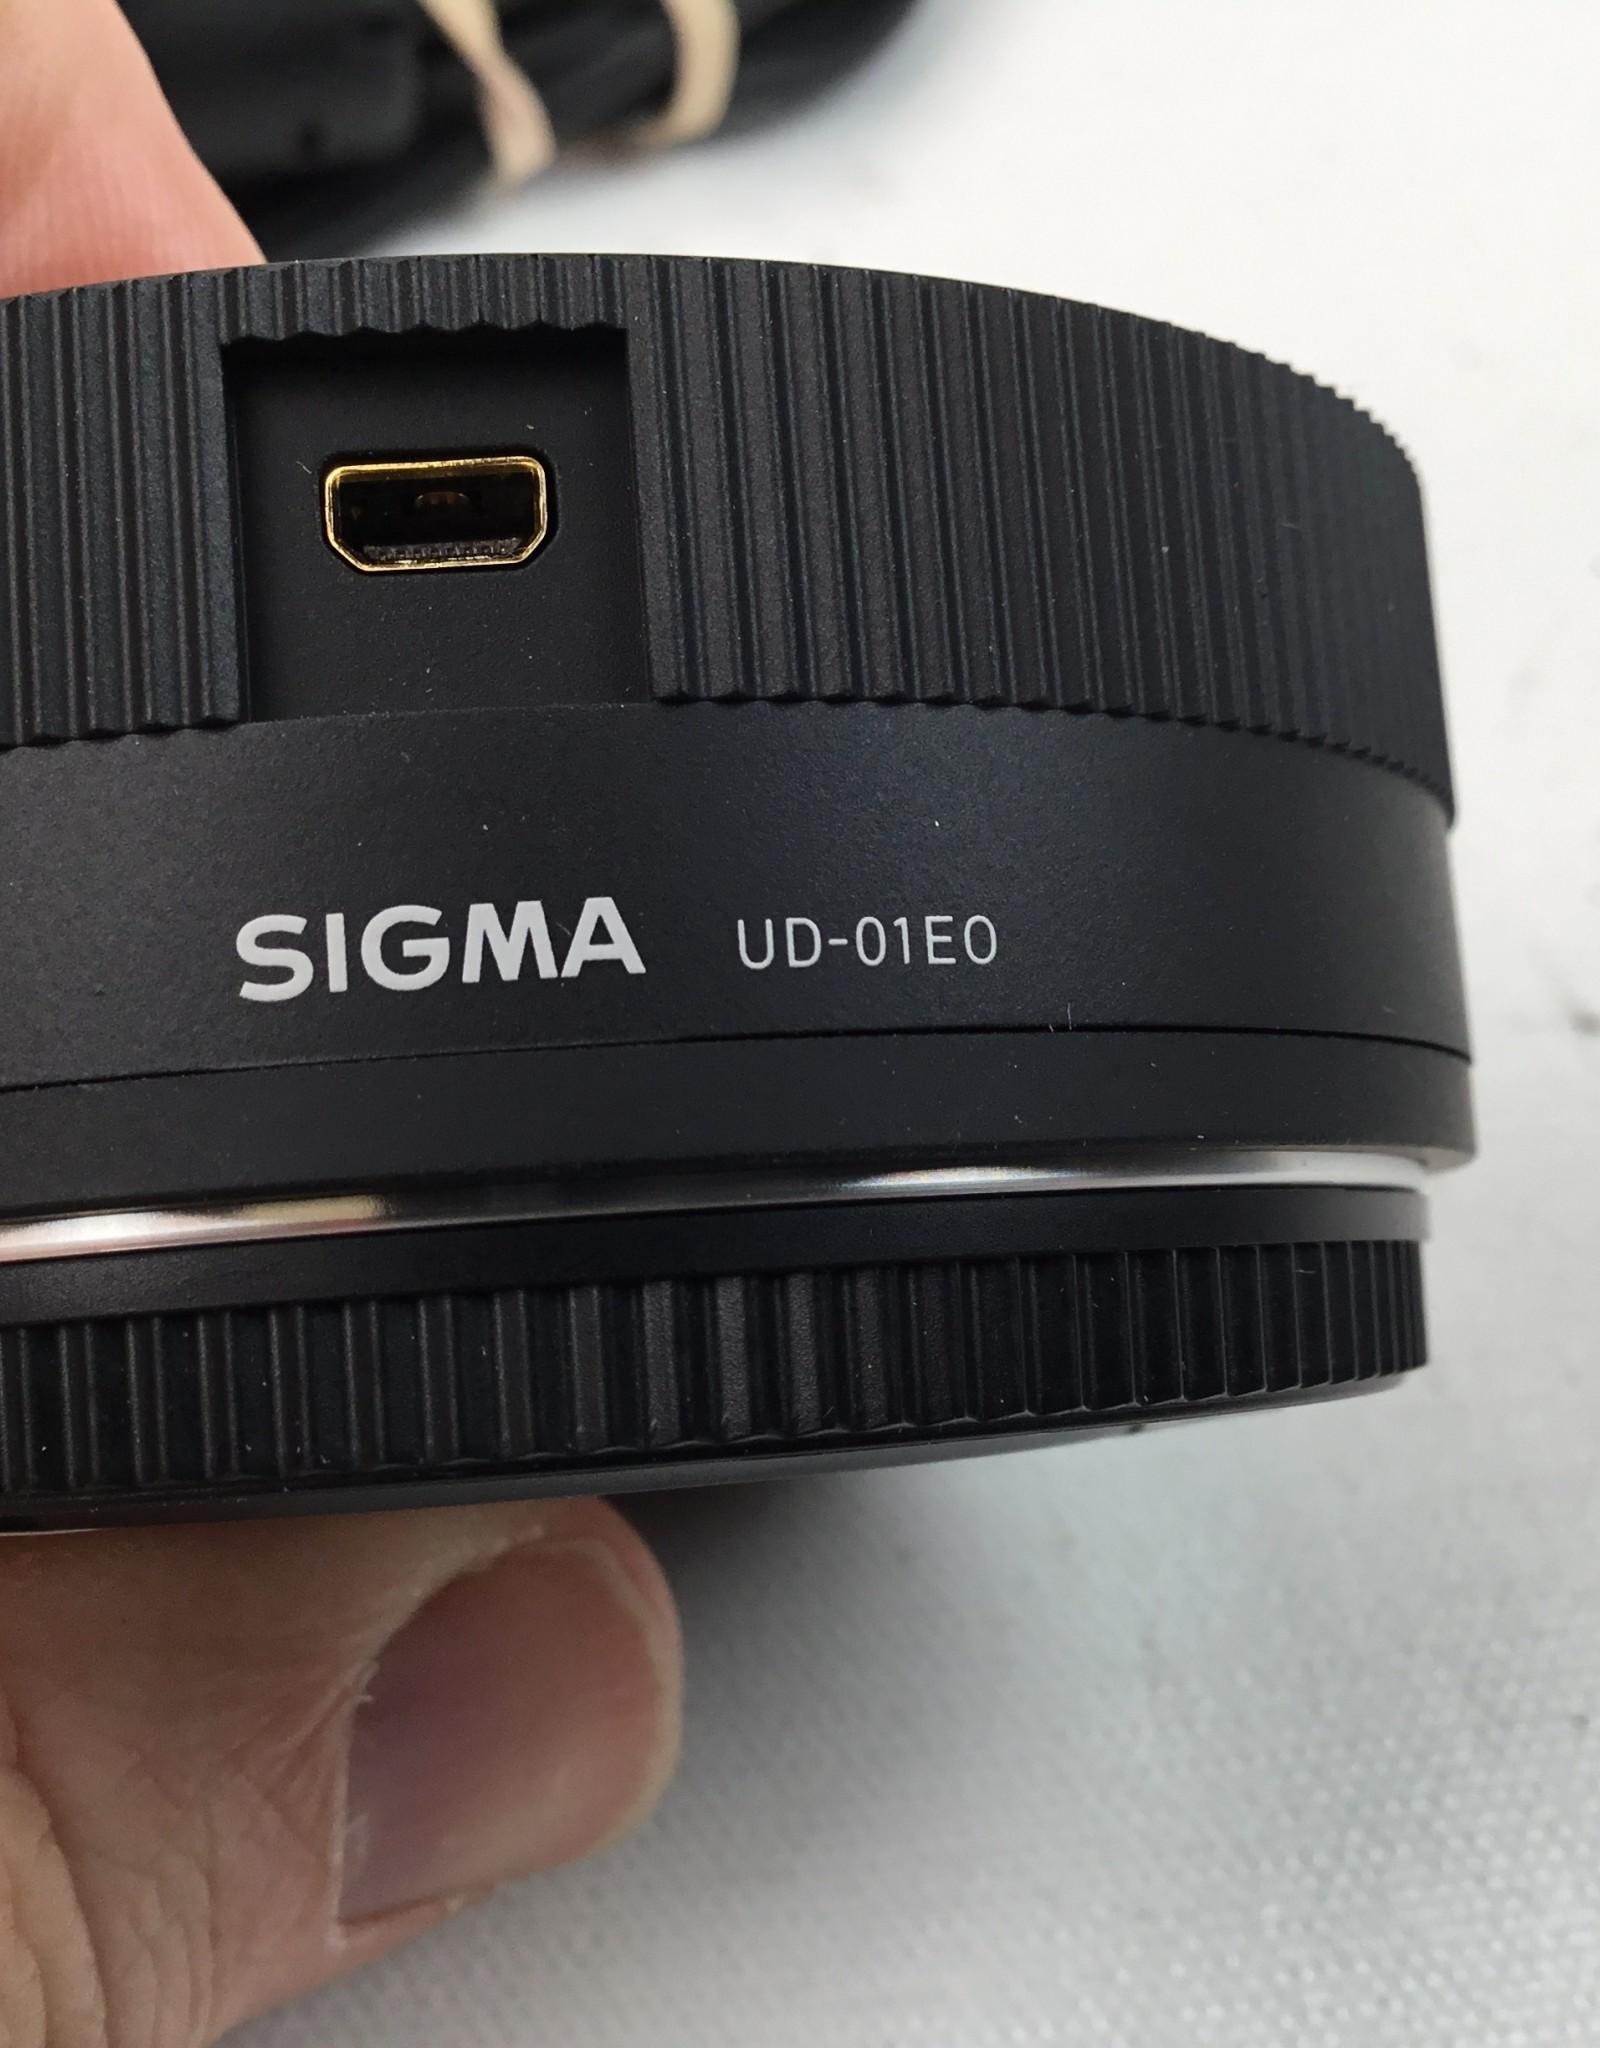 SIGMA Sigma UD-01E0 Lens Dock for Canon Used EX+